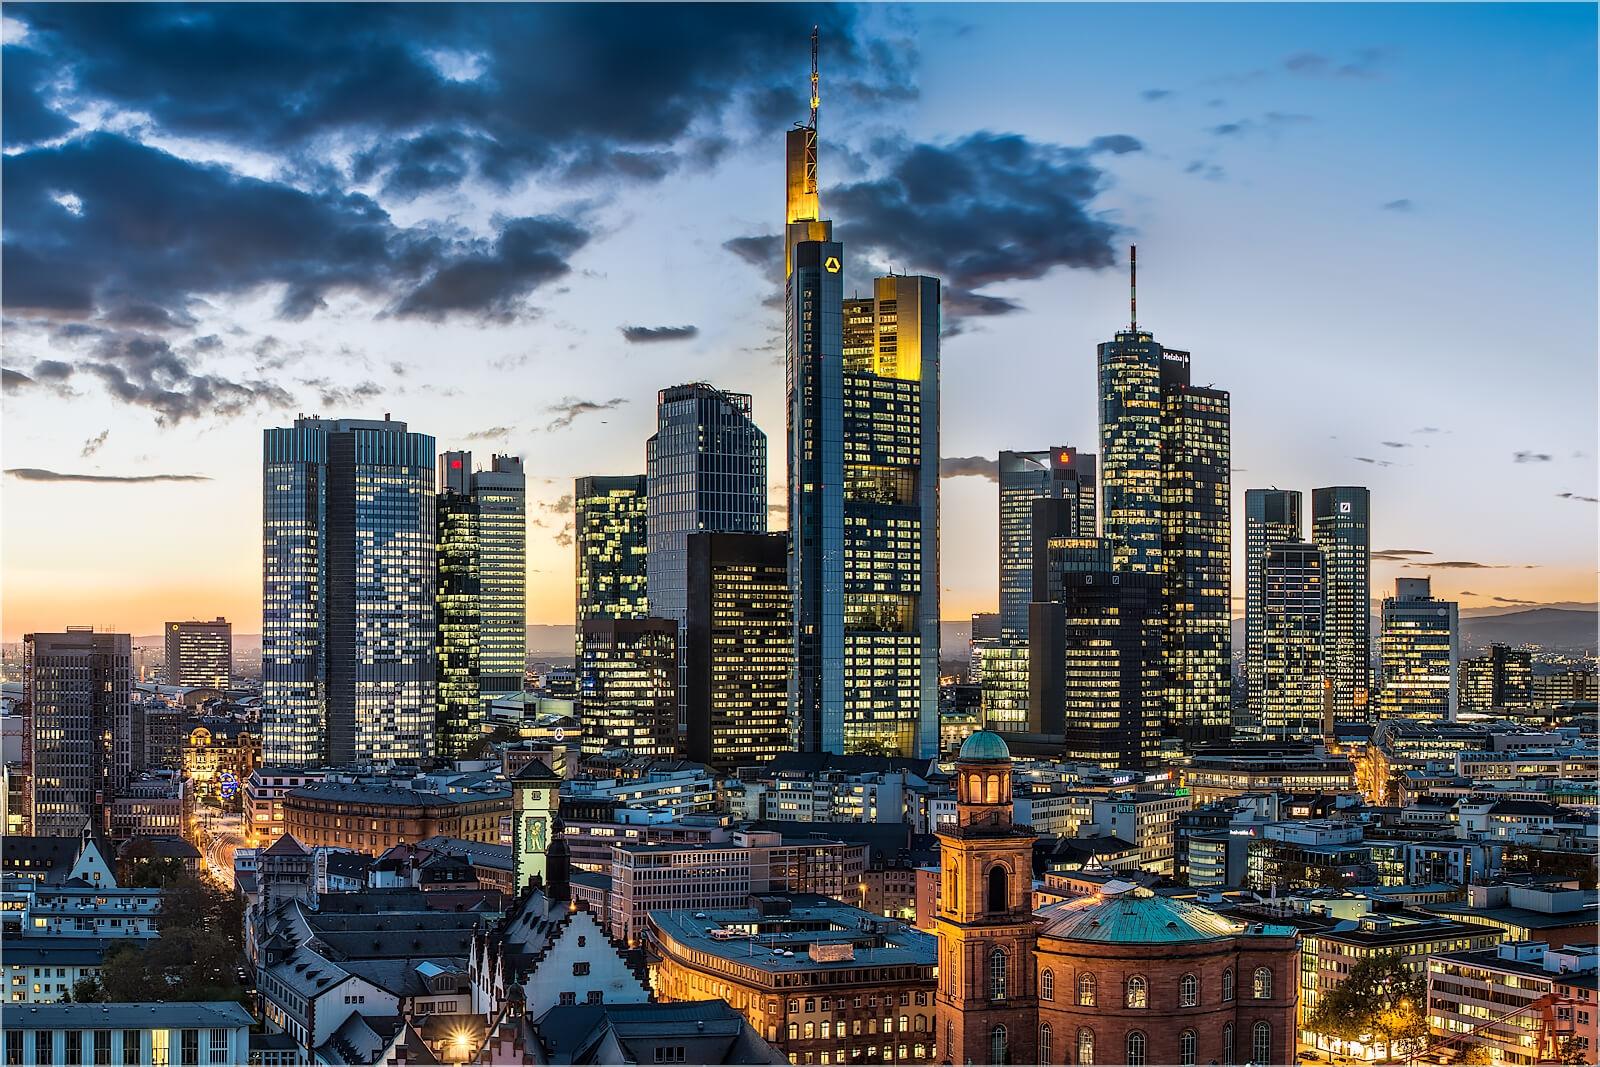 Wandbild Im Bankenviertel Frankfurt/Main